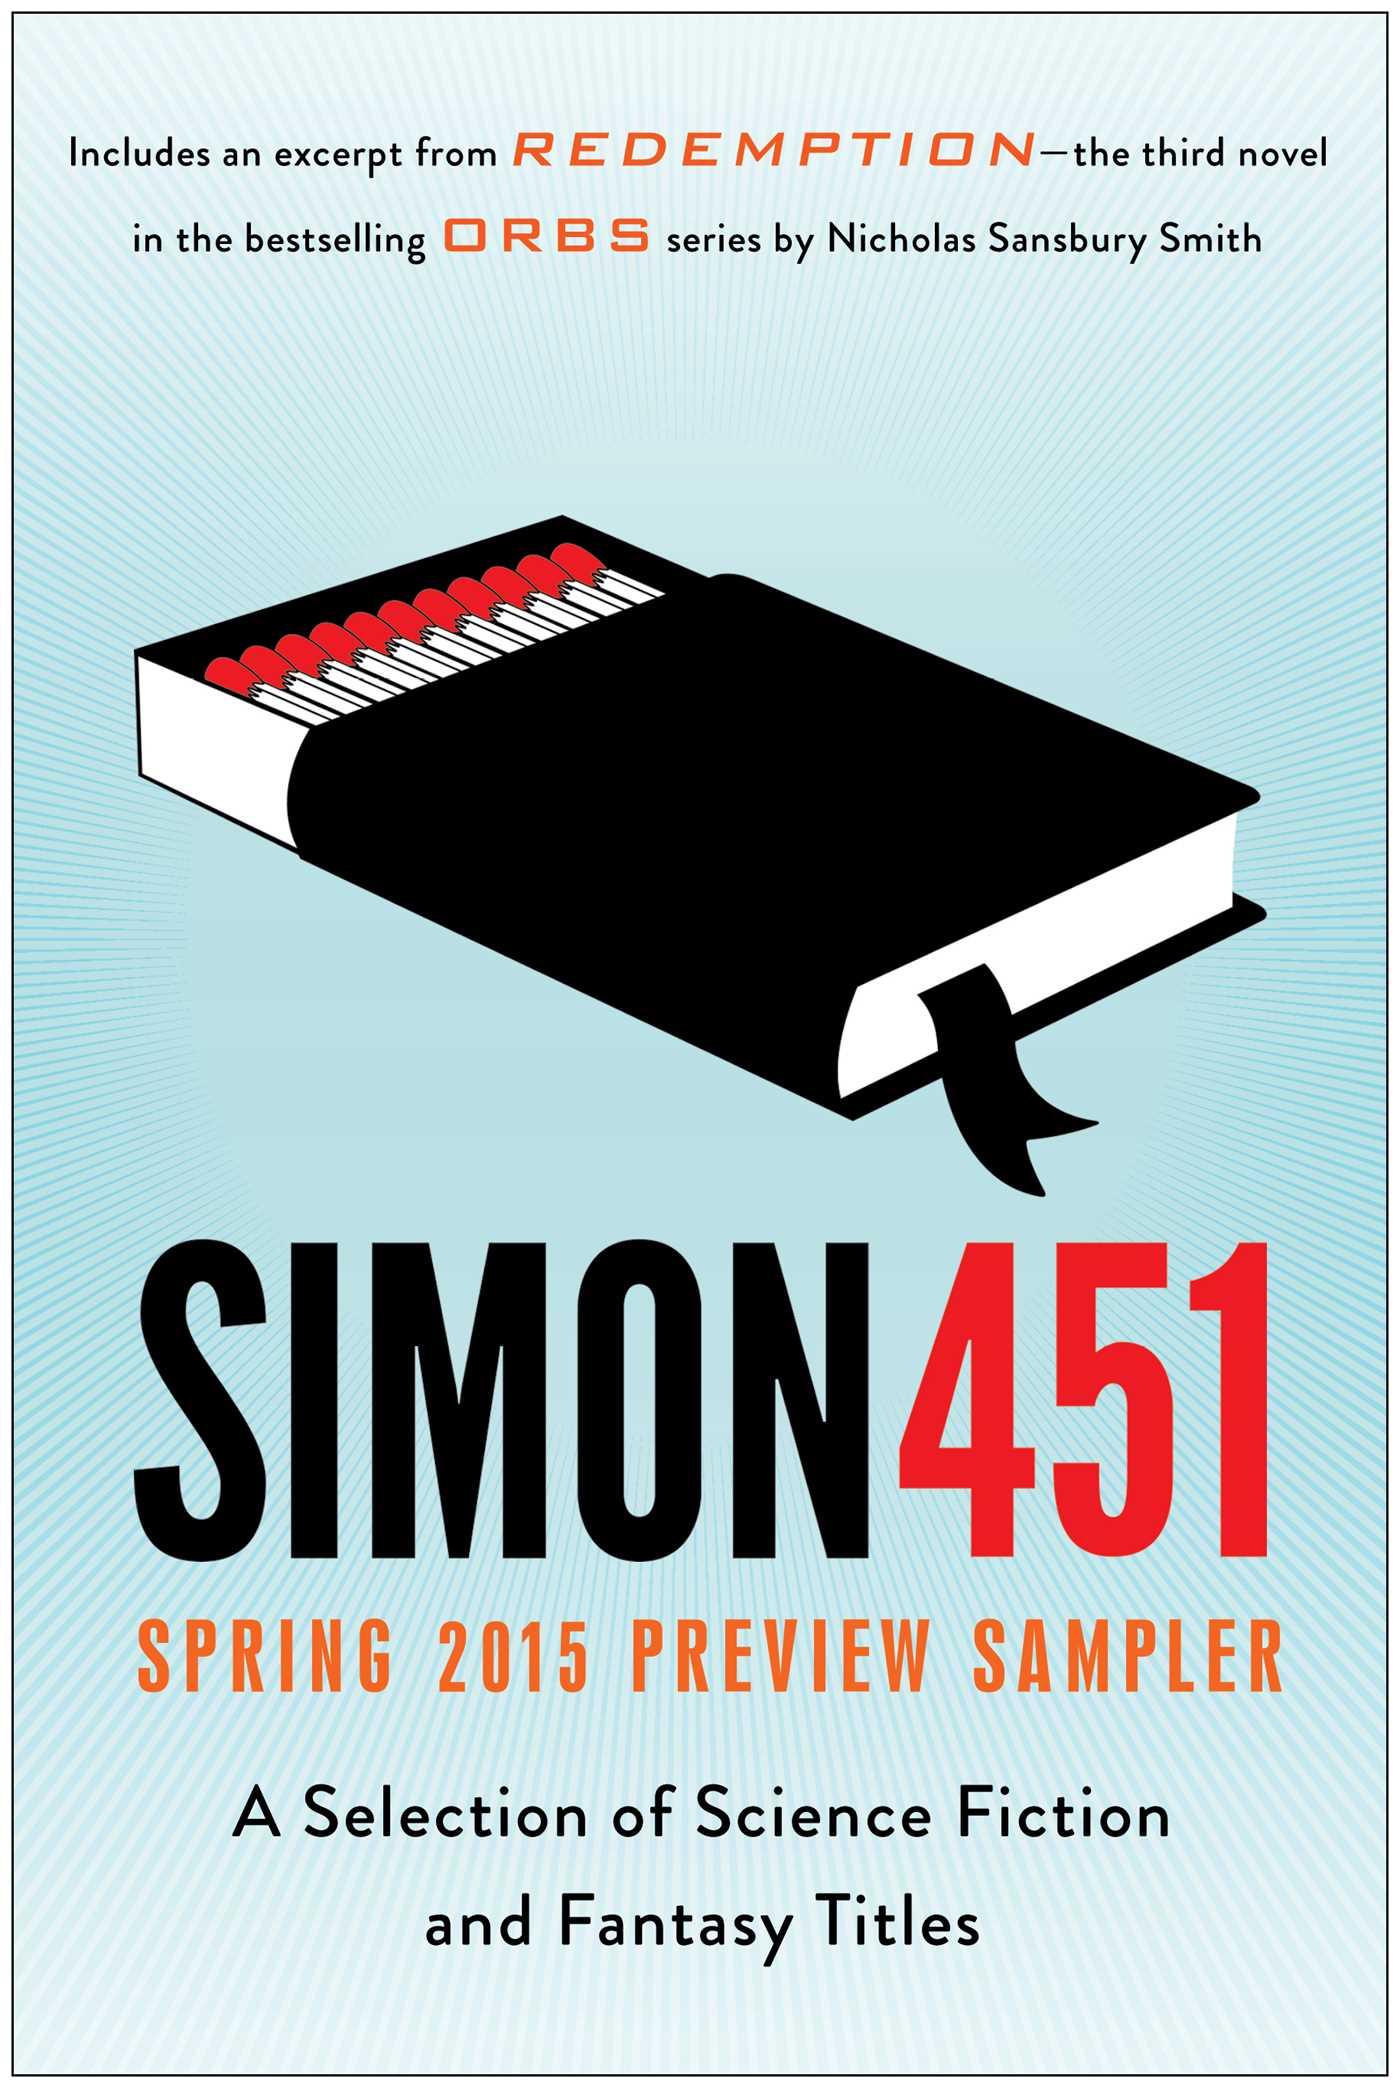 Simon451 spring 2015 preview sampler 9781501106866 hr